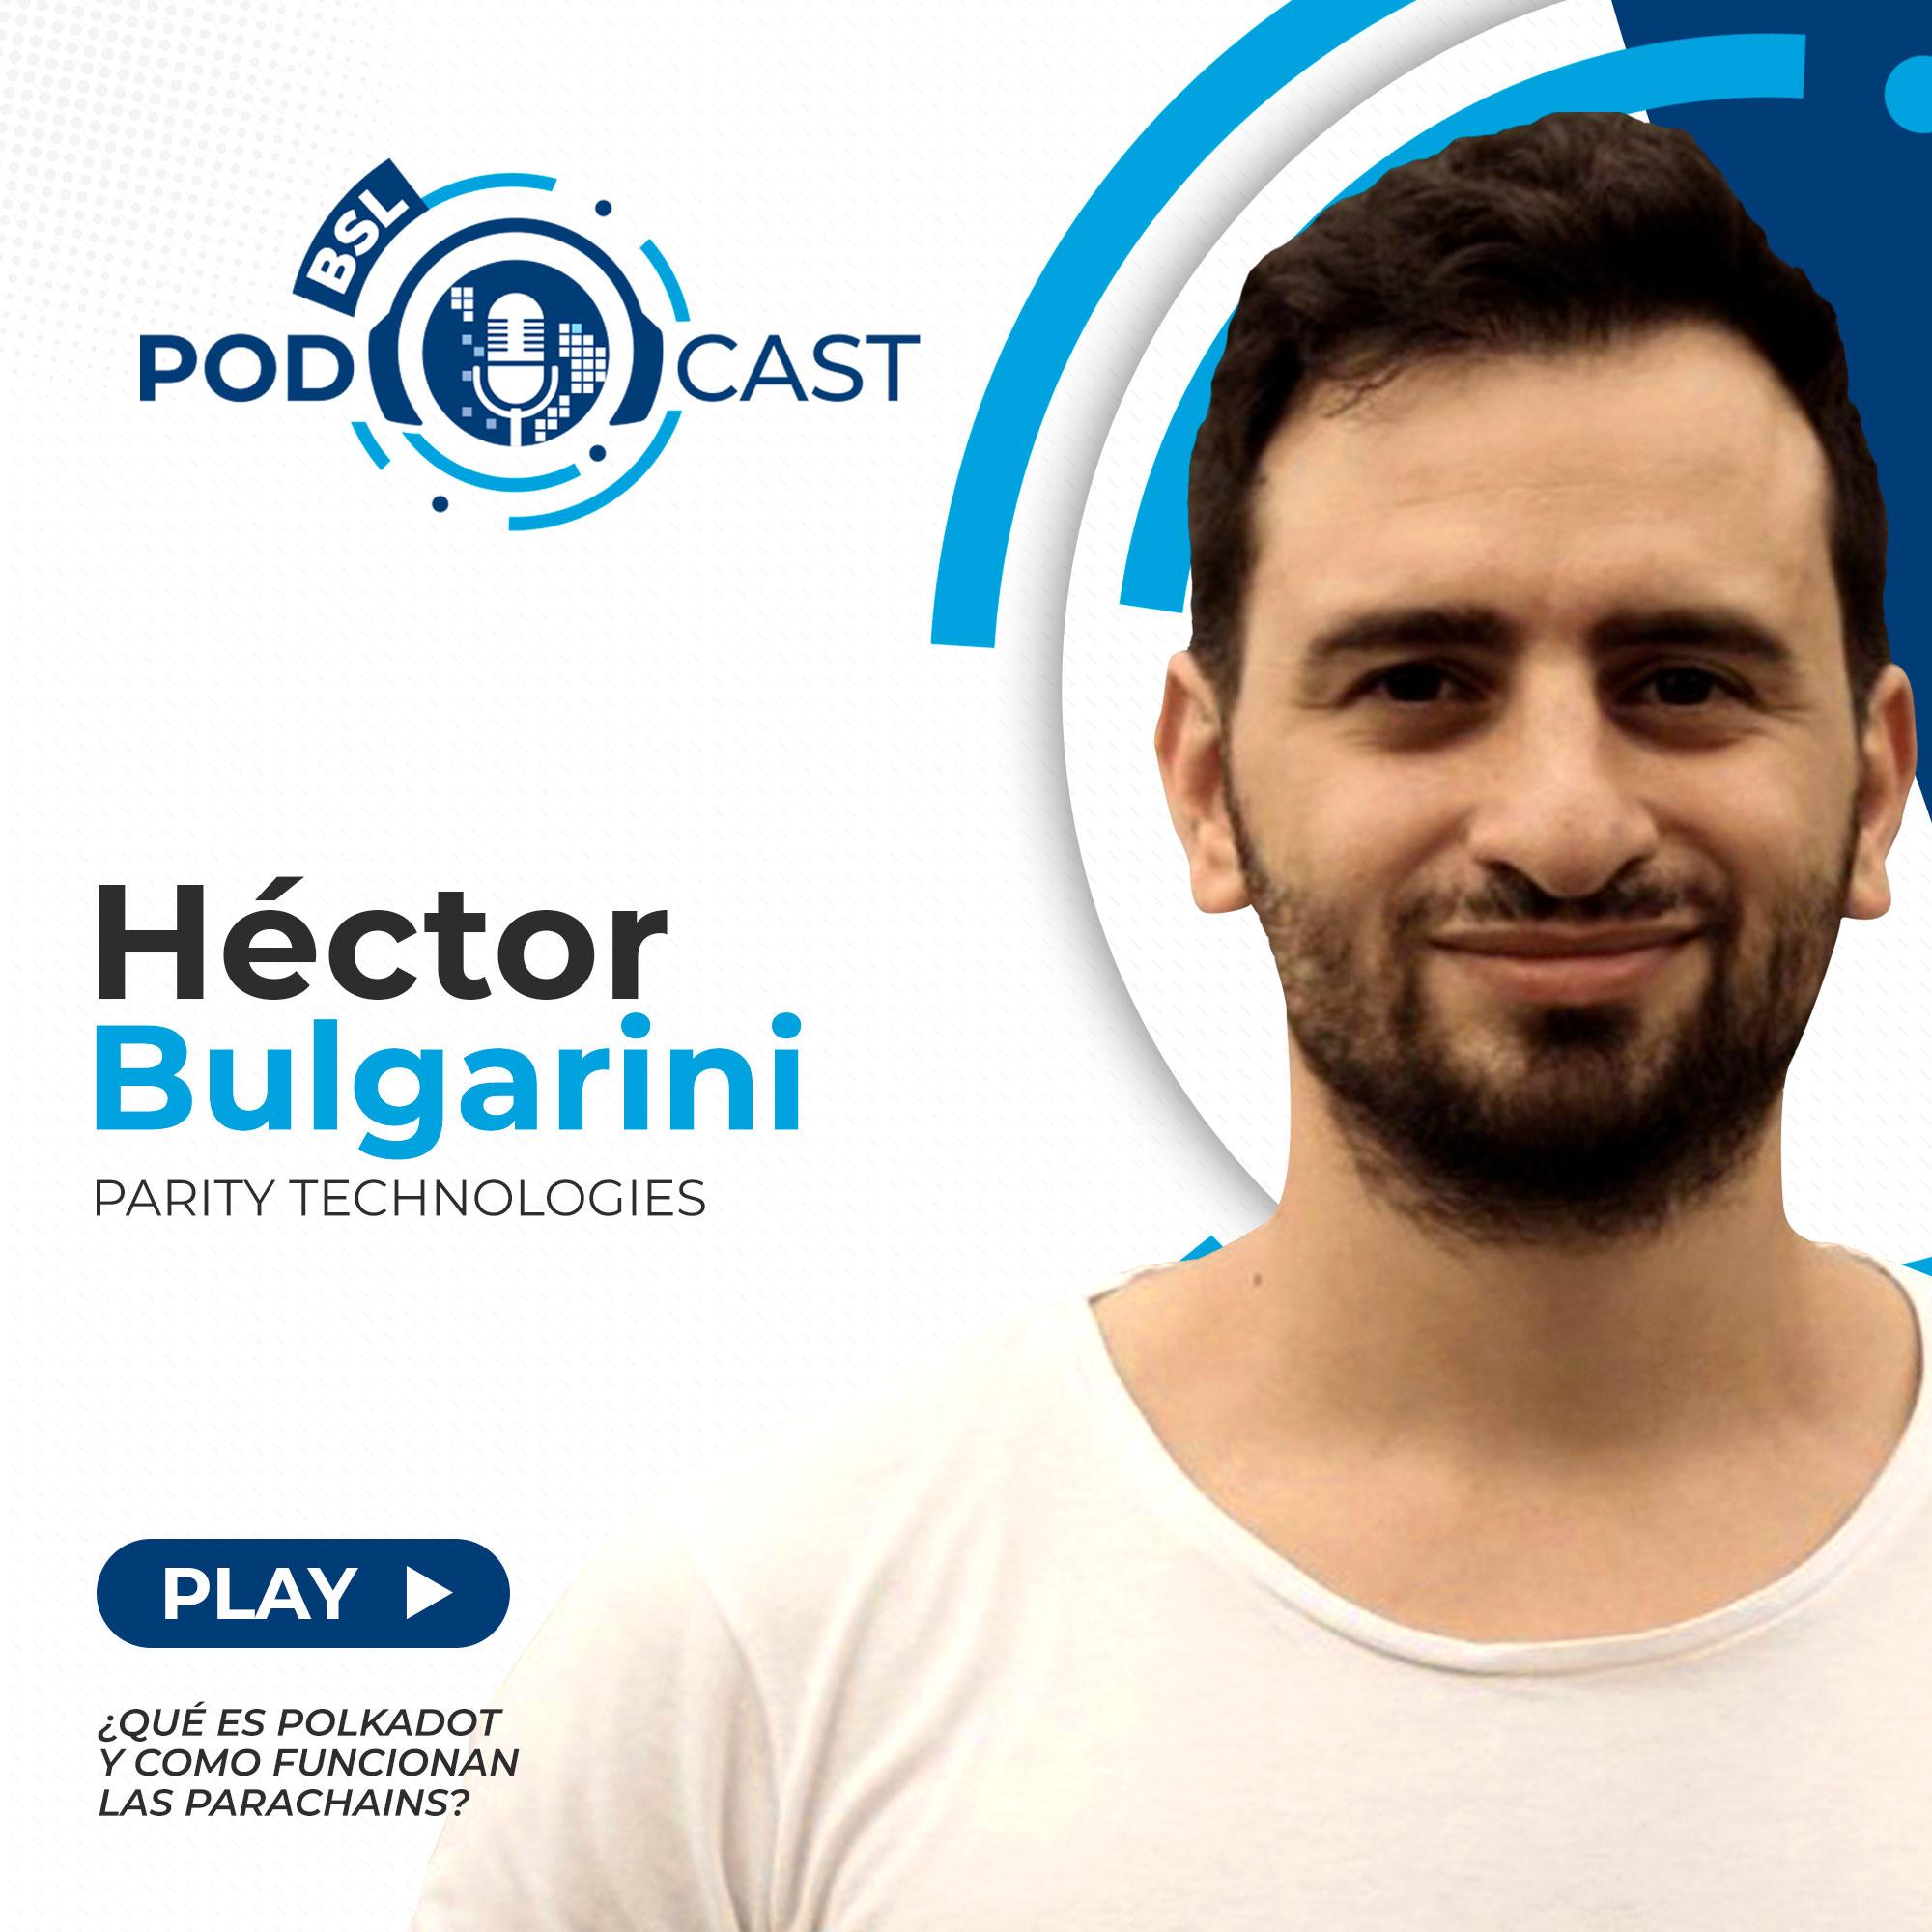 bsl podcast hector bulgarini que es polkadot parachains